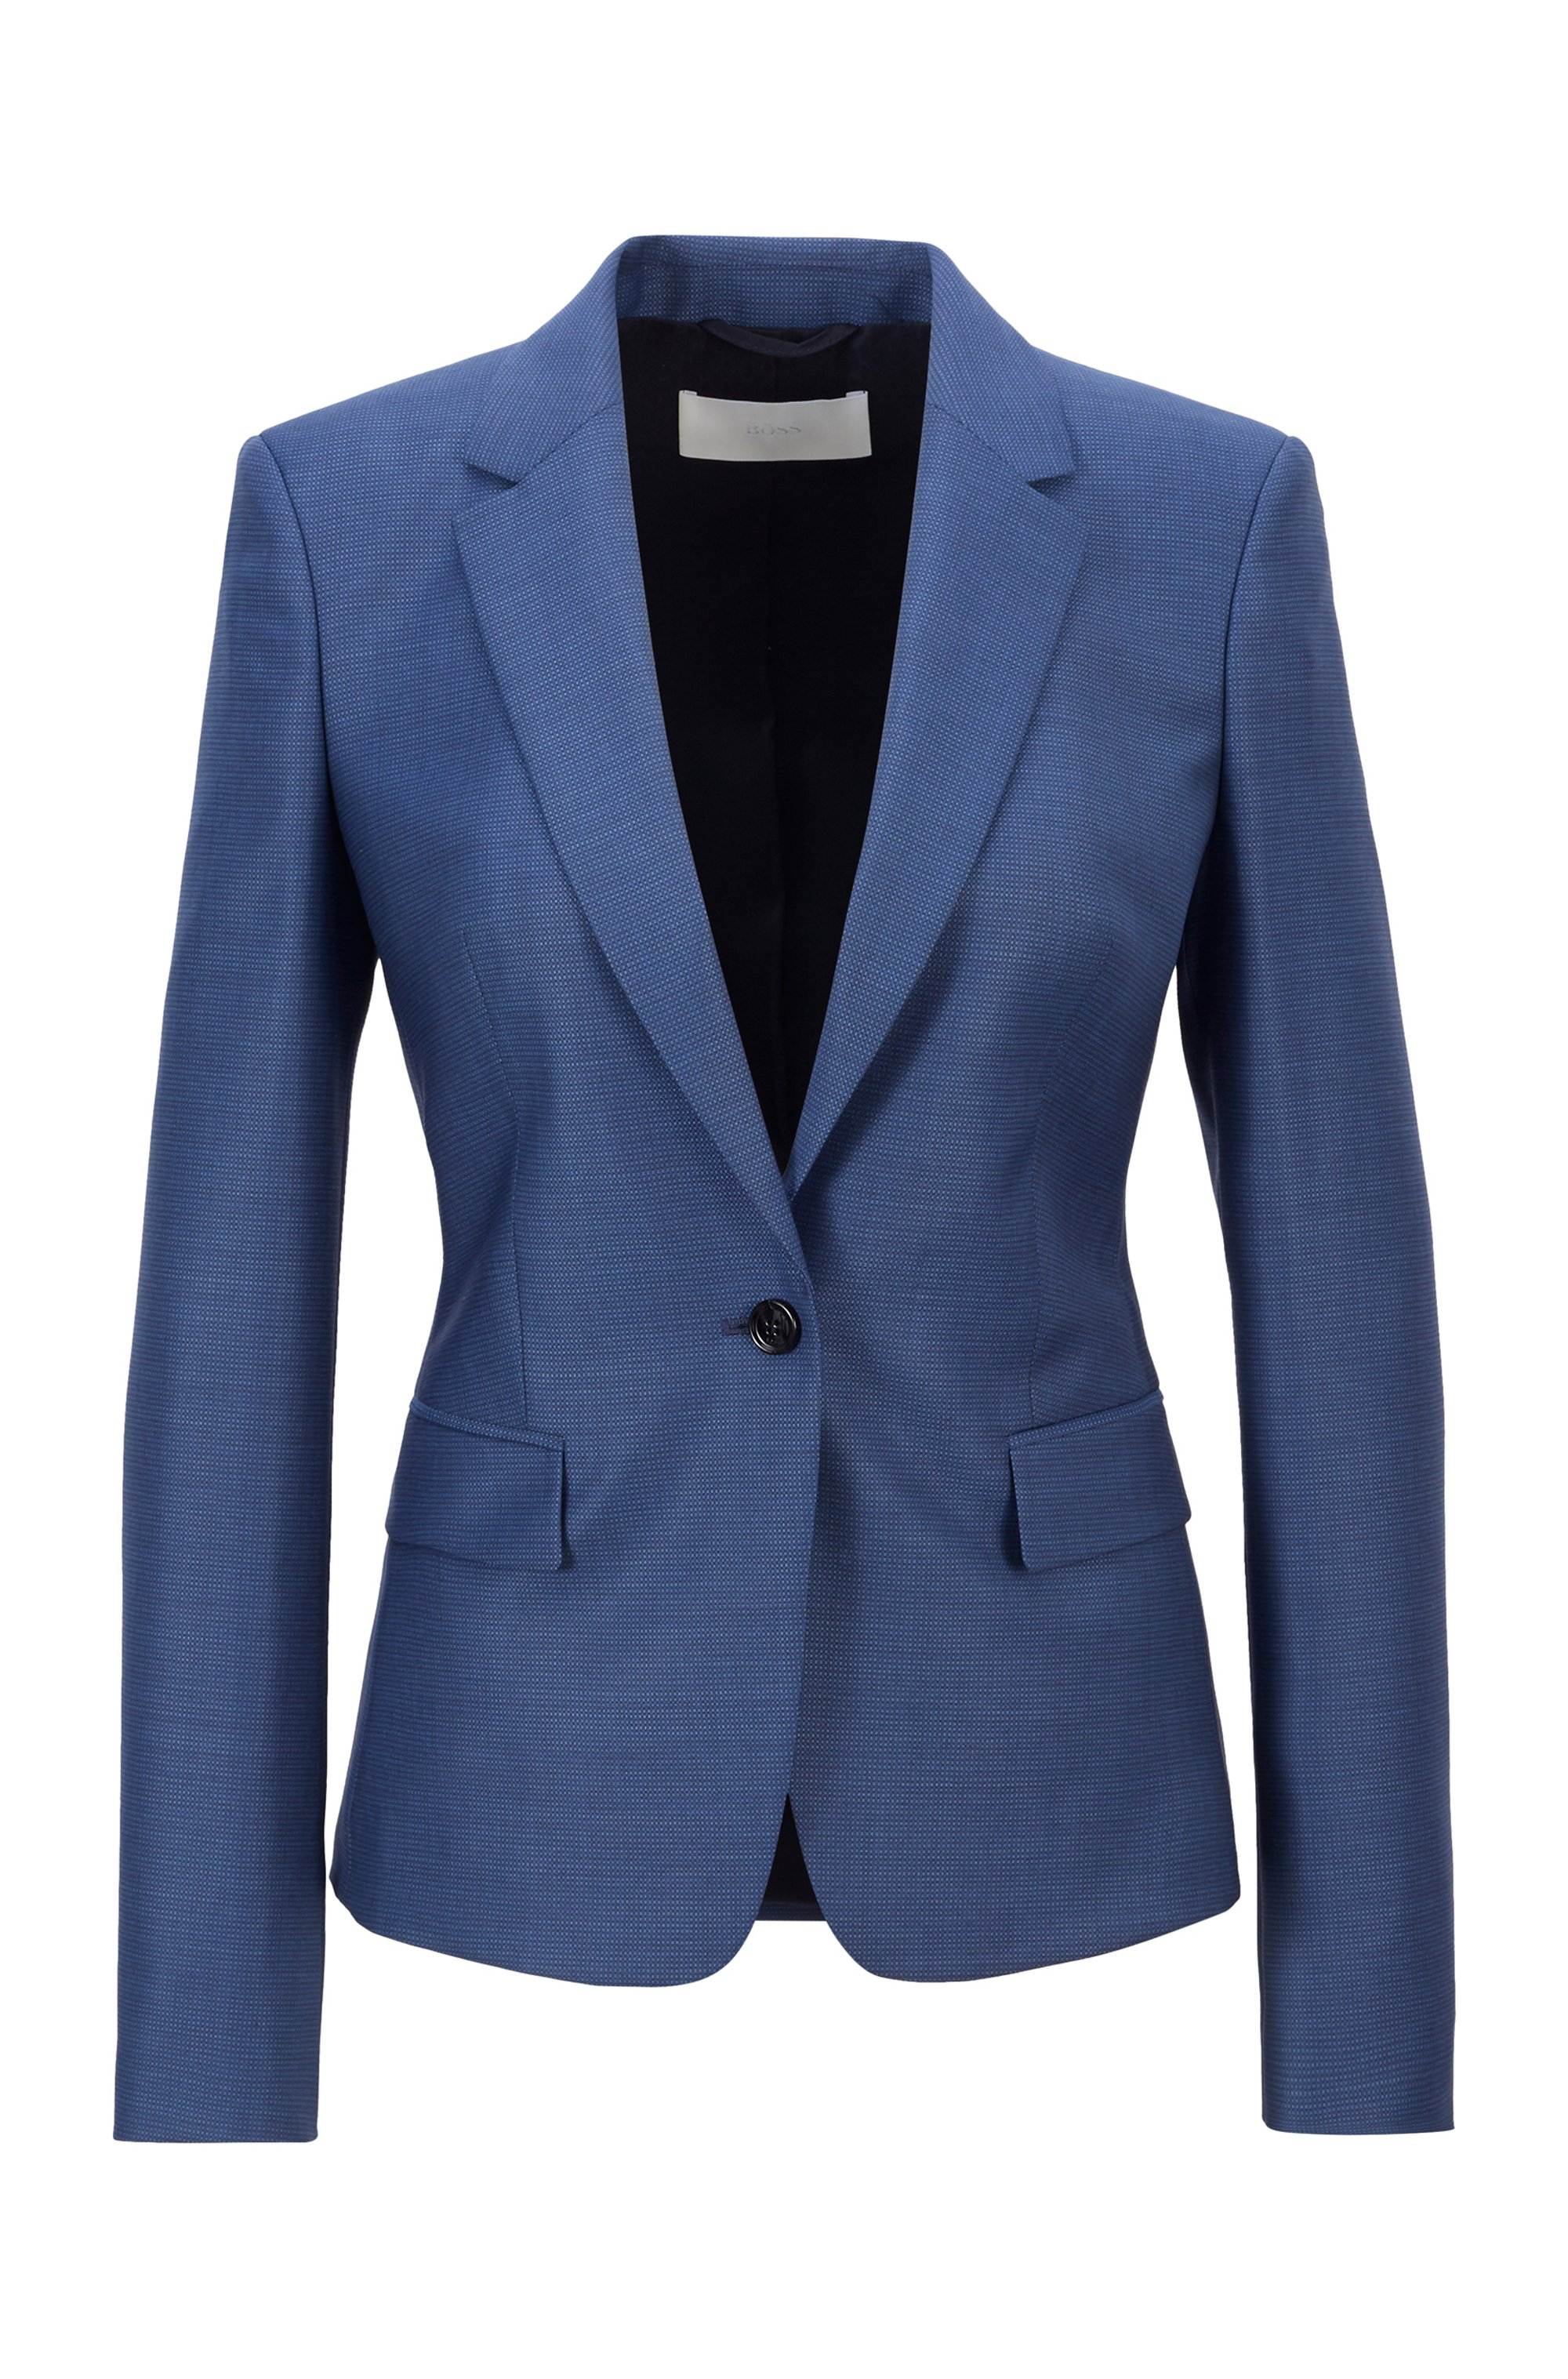 Regular-fit jacket in micro-patterned virgin wool, Patterned